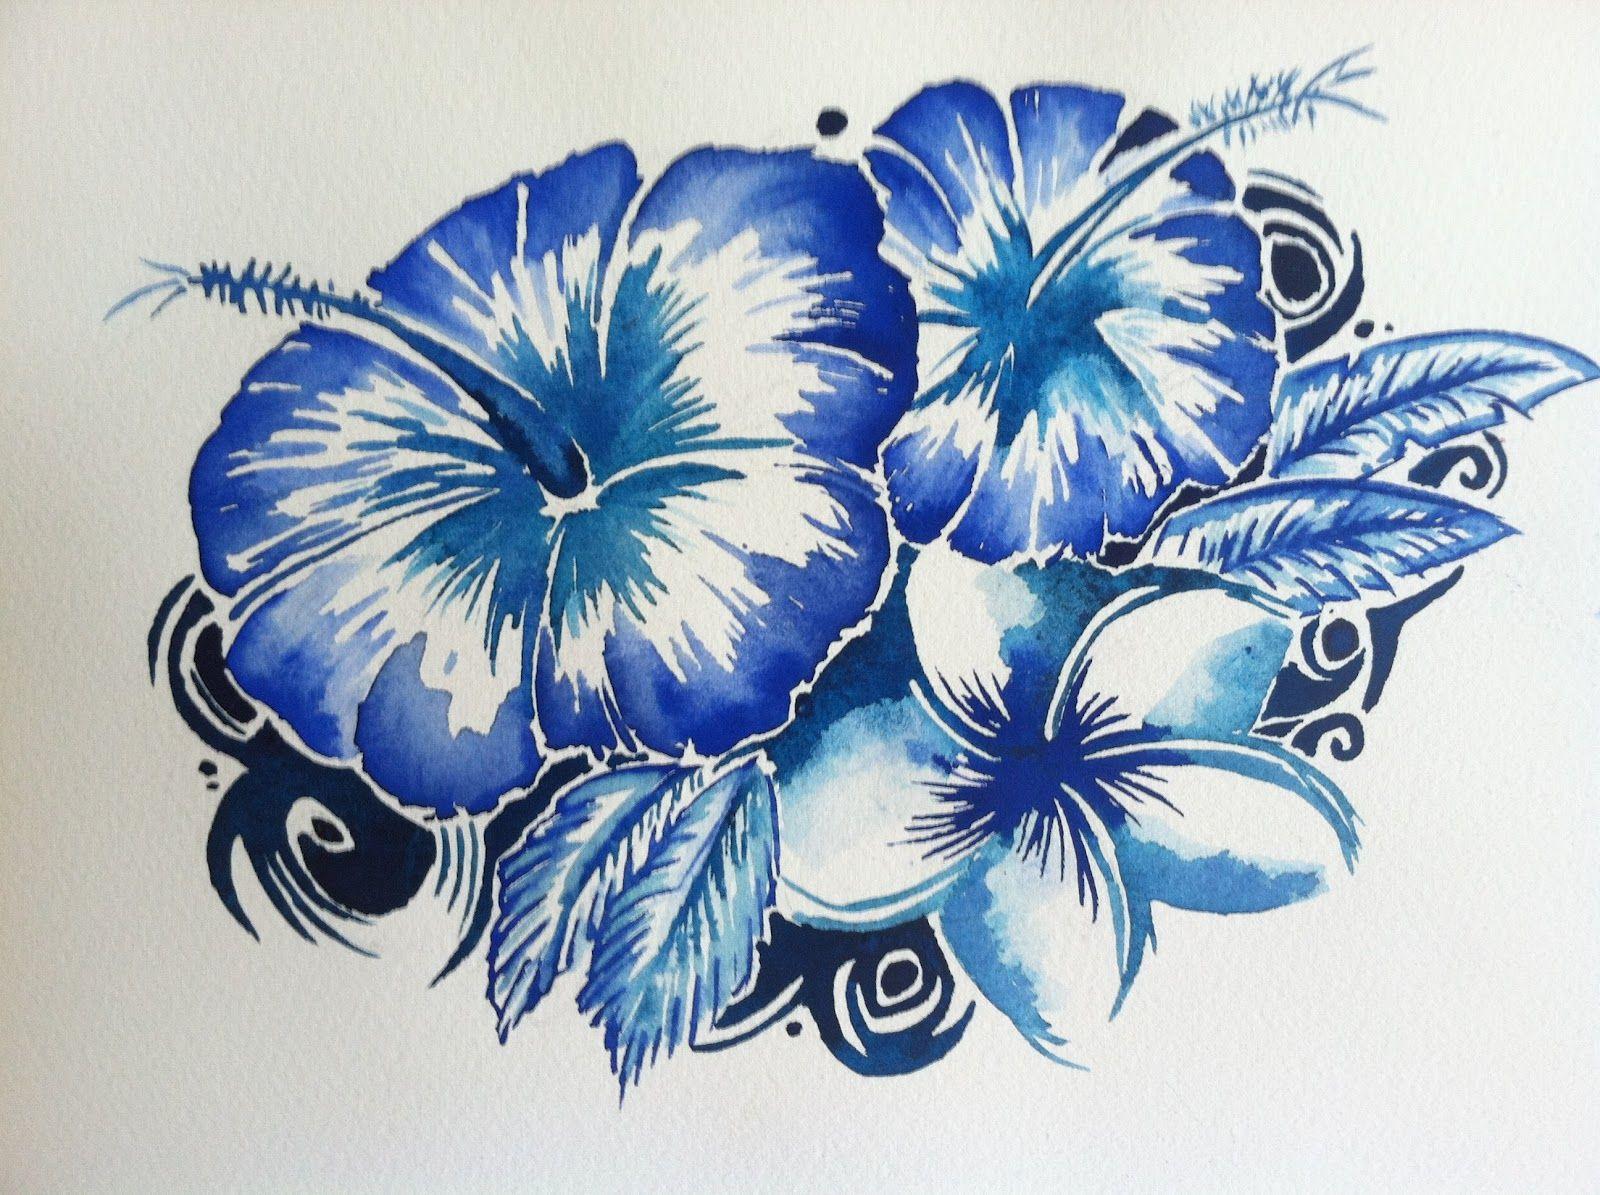 Hawaiian Scene Paintings Hibiscus Pinterest Hibiscus And